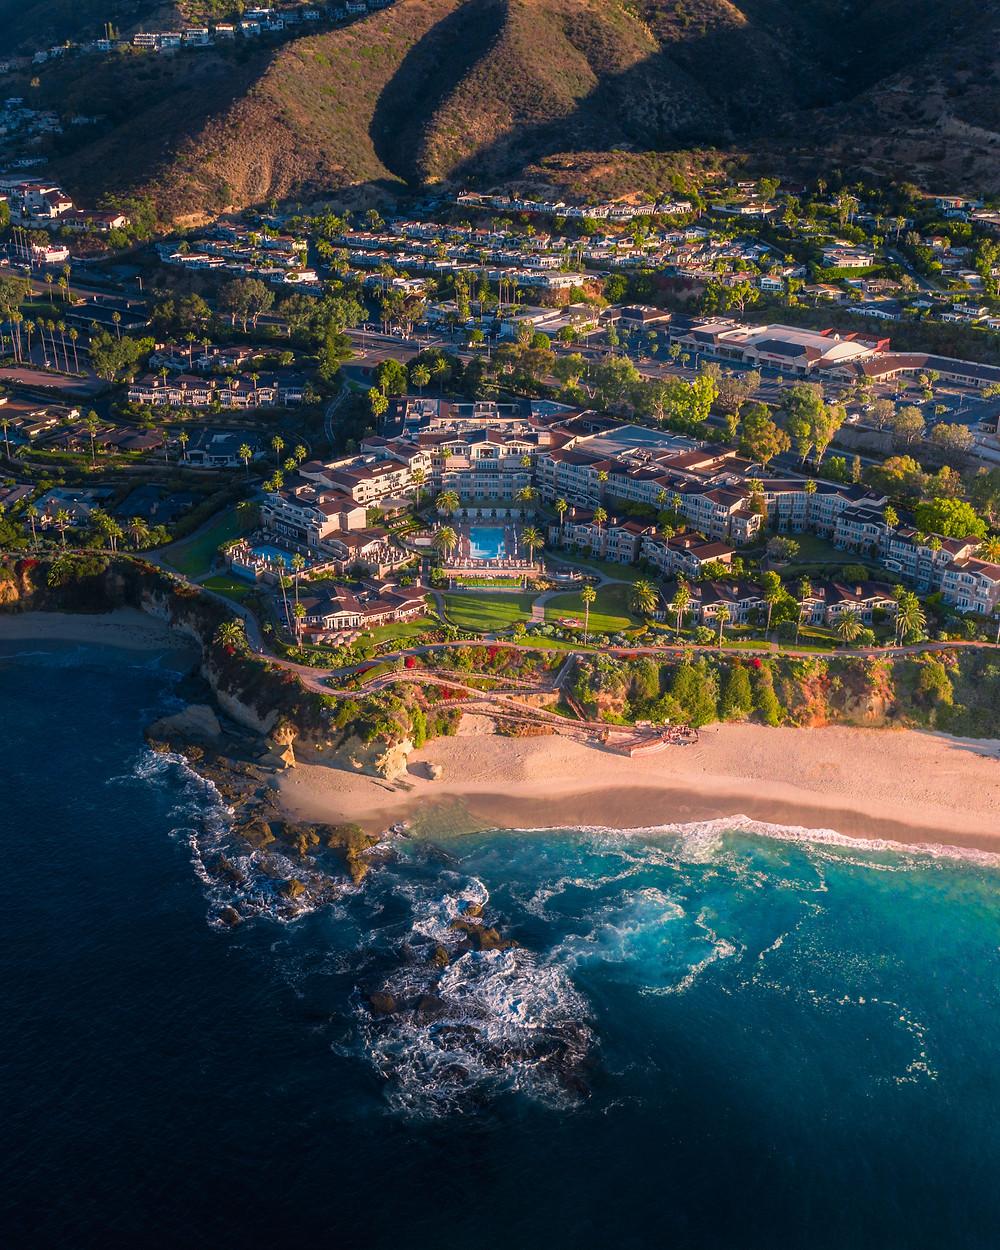 Montage Laguna Beach resort sitting over a beautiful cliff overlooking blue ocean waters